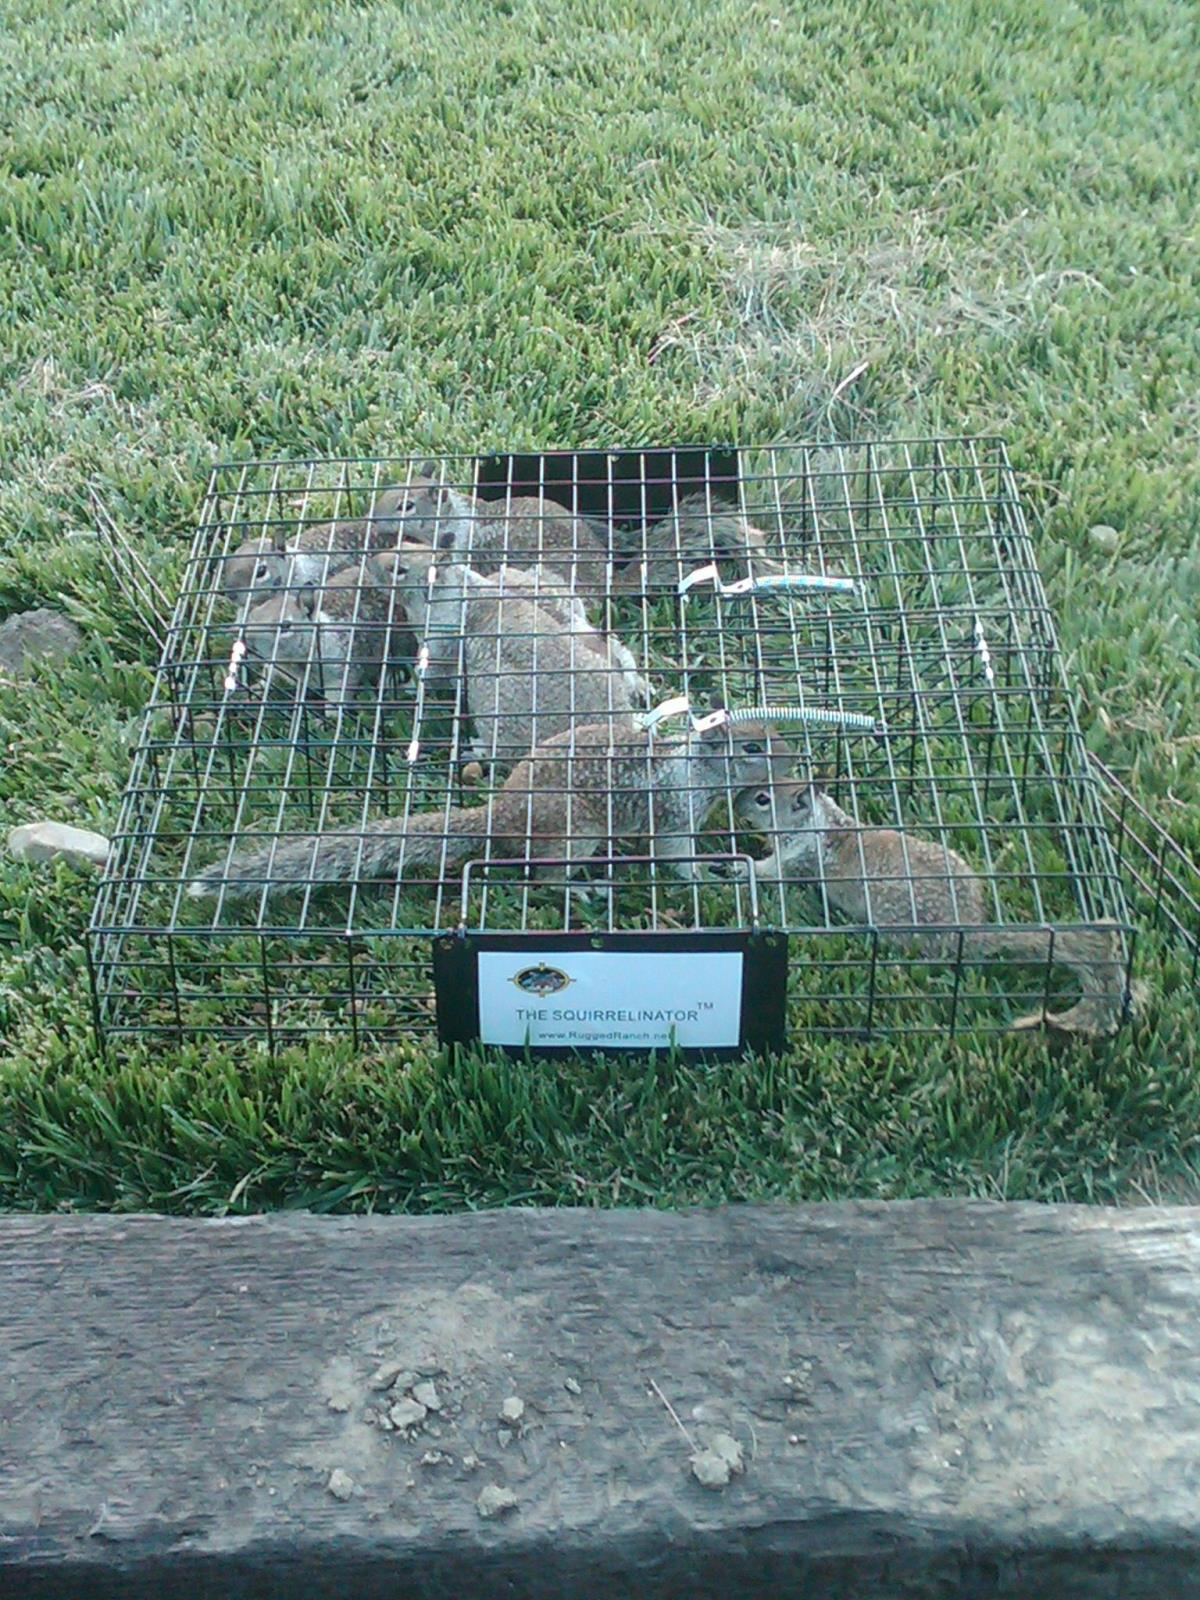 RUGGED RANCH SQUIRRELINATOR LIVE MULTI CATCH SQUIRREL TRAP ...